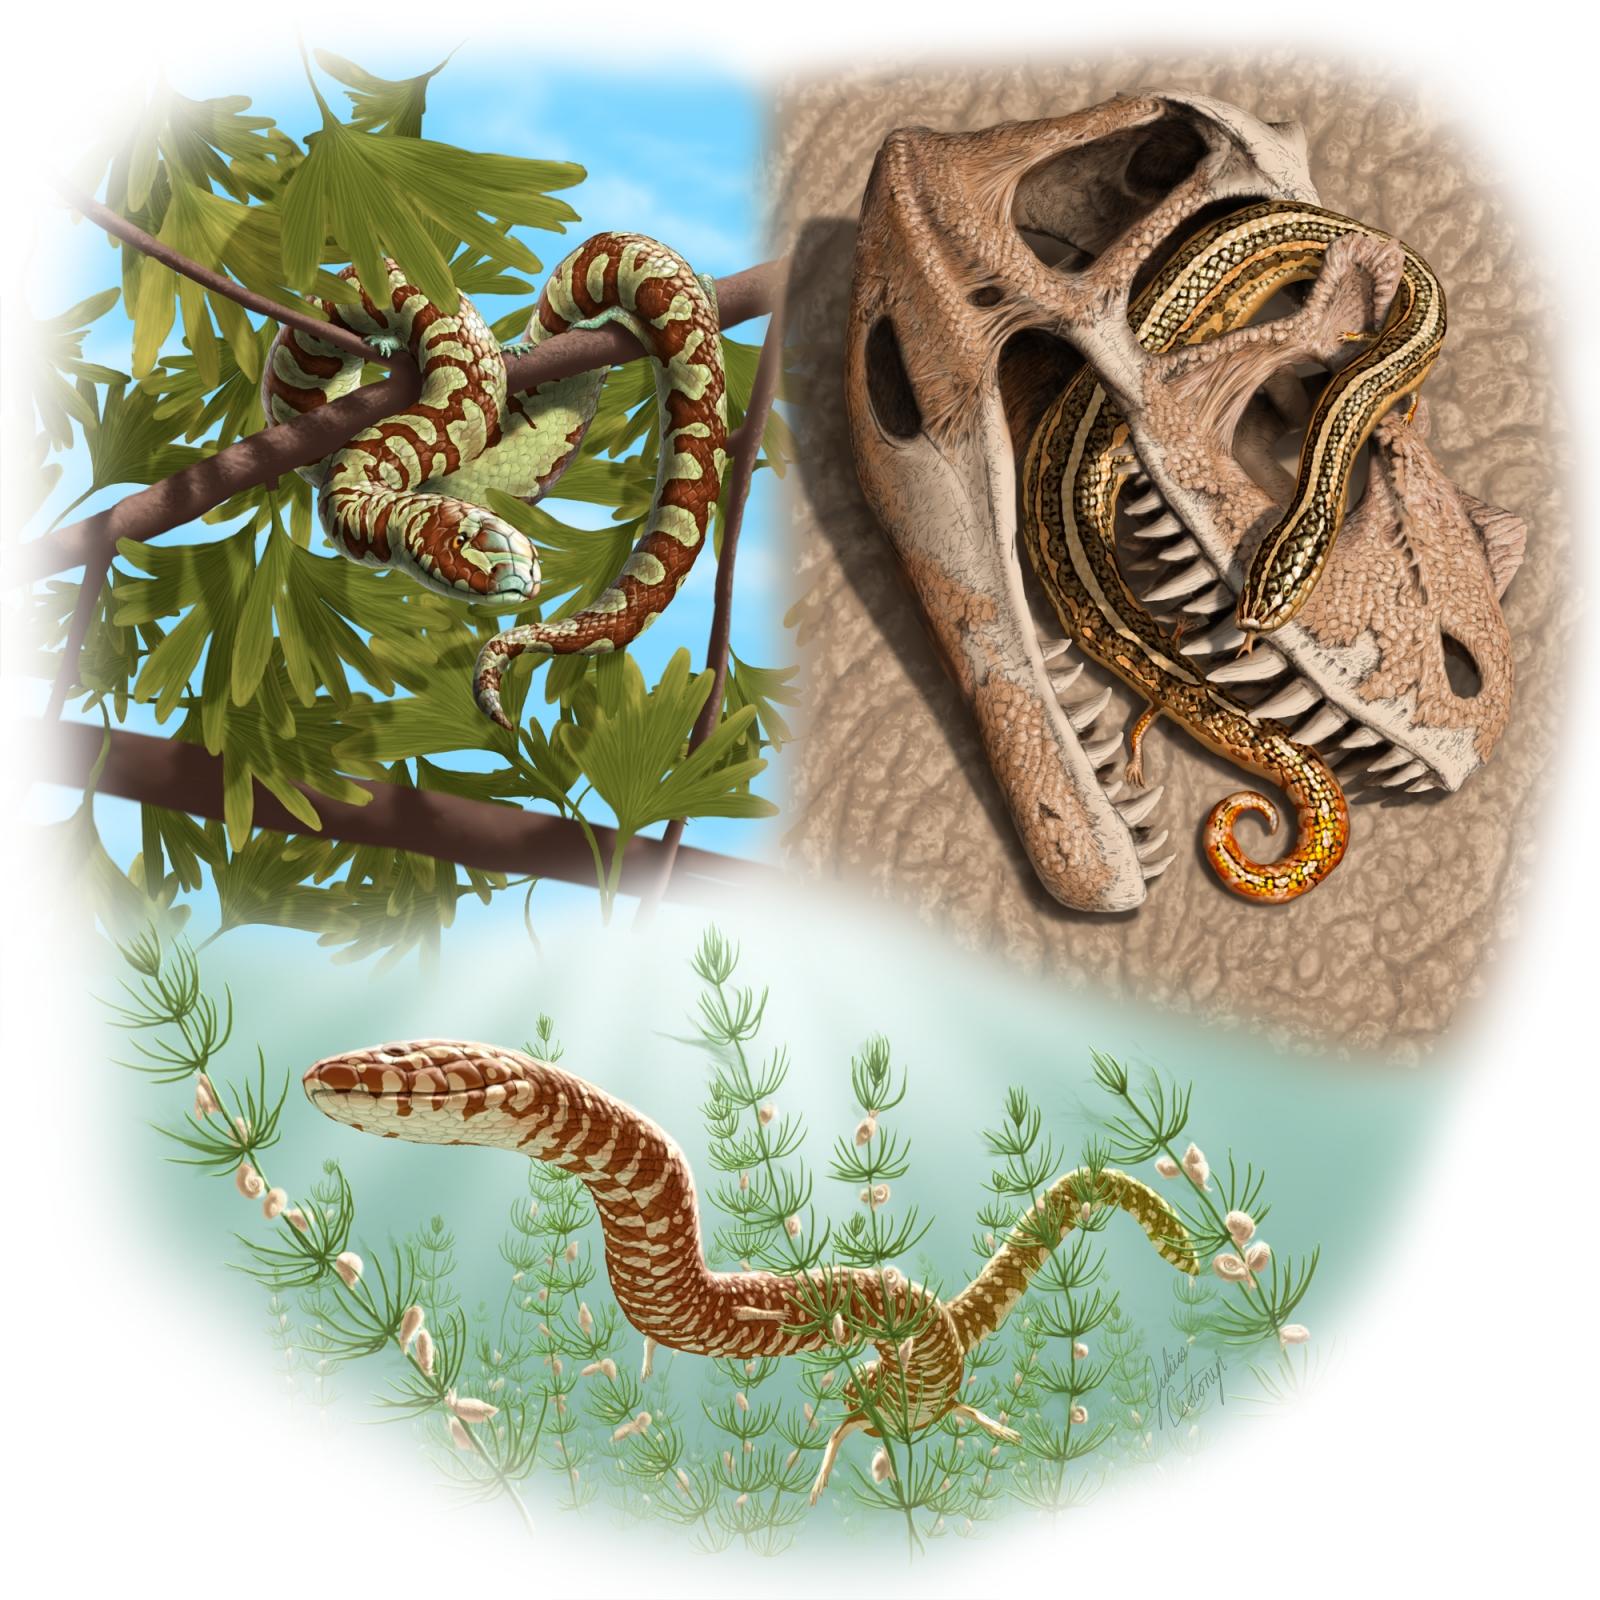 worlds-oldest-snakes.jpg?w=735&h=735&l=50&t=40